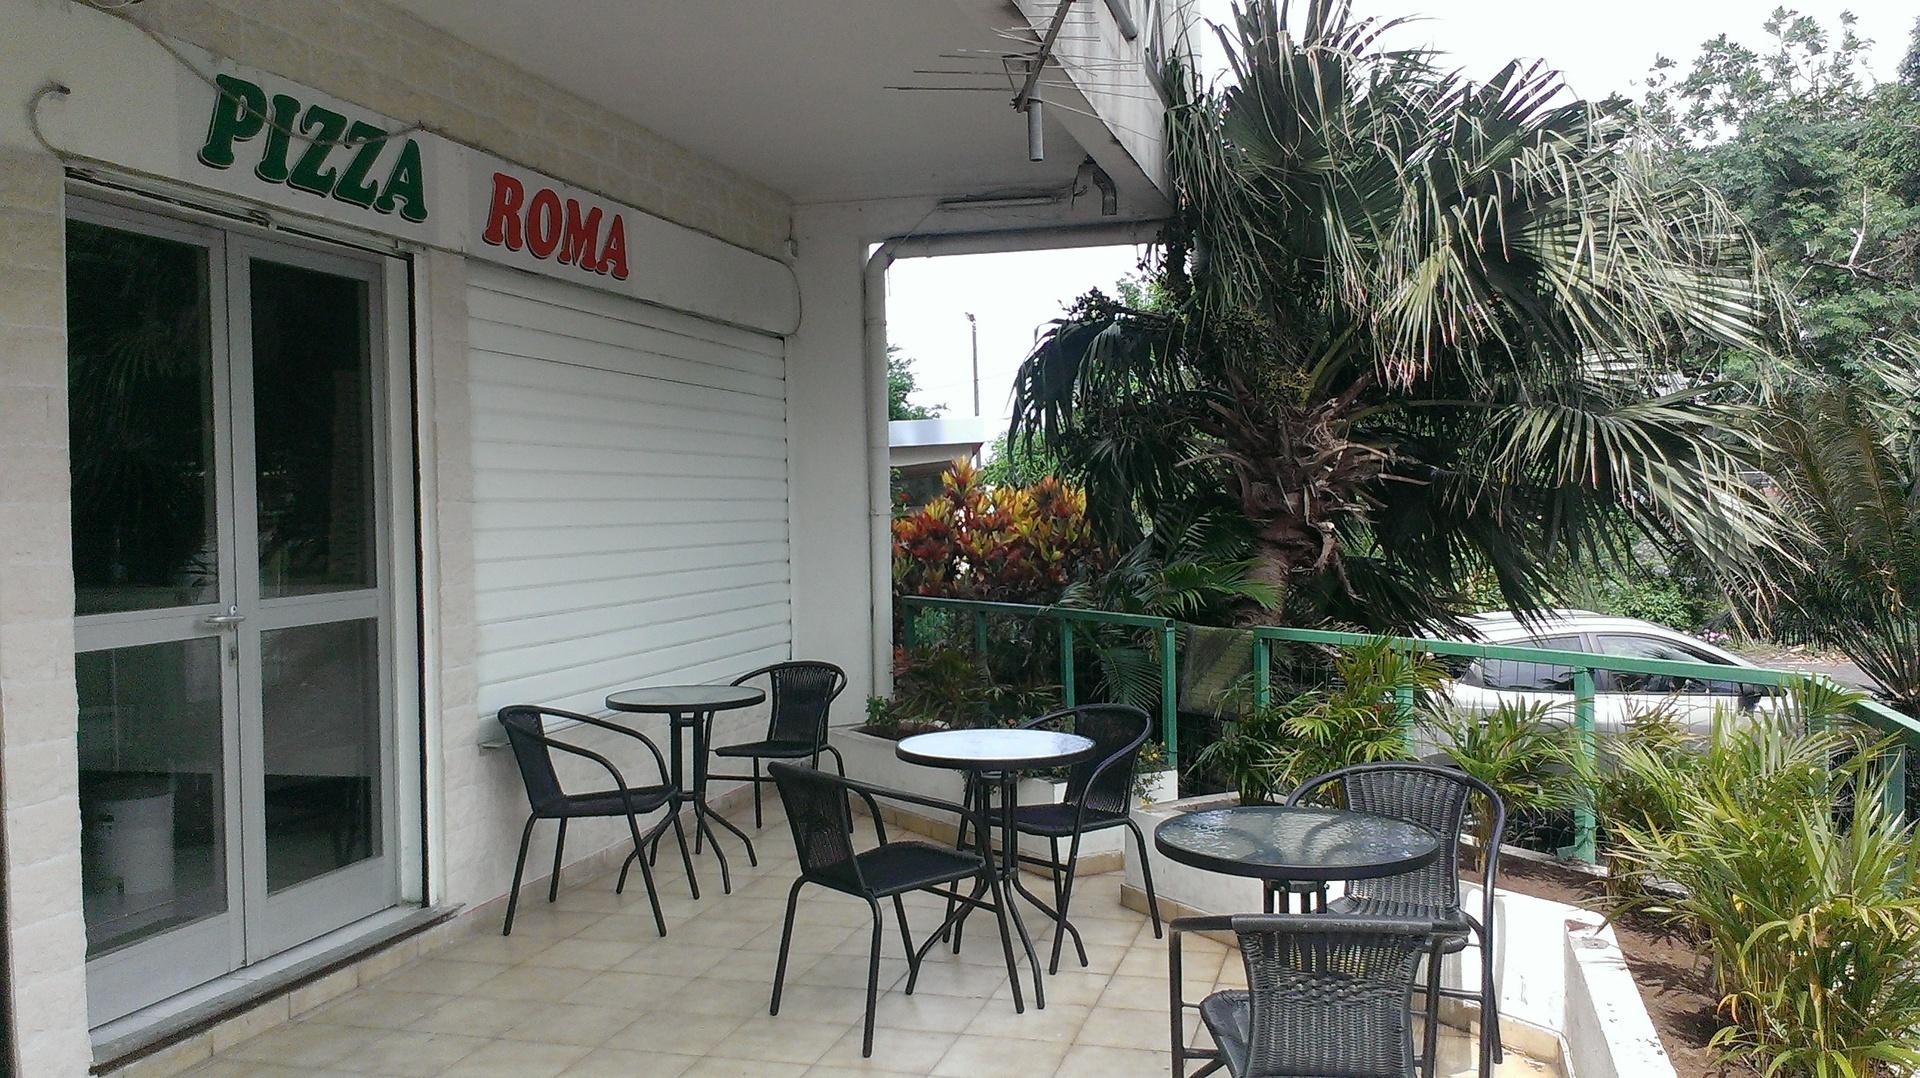 Pizza Roma à Saint-Denis